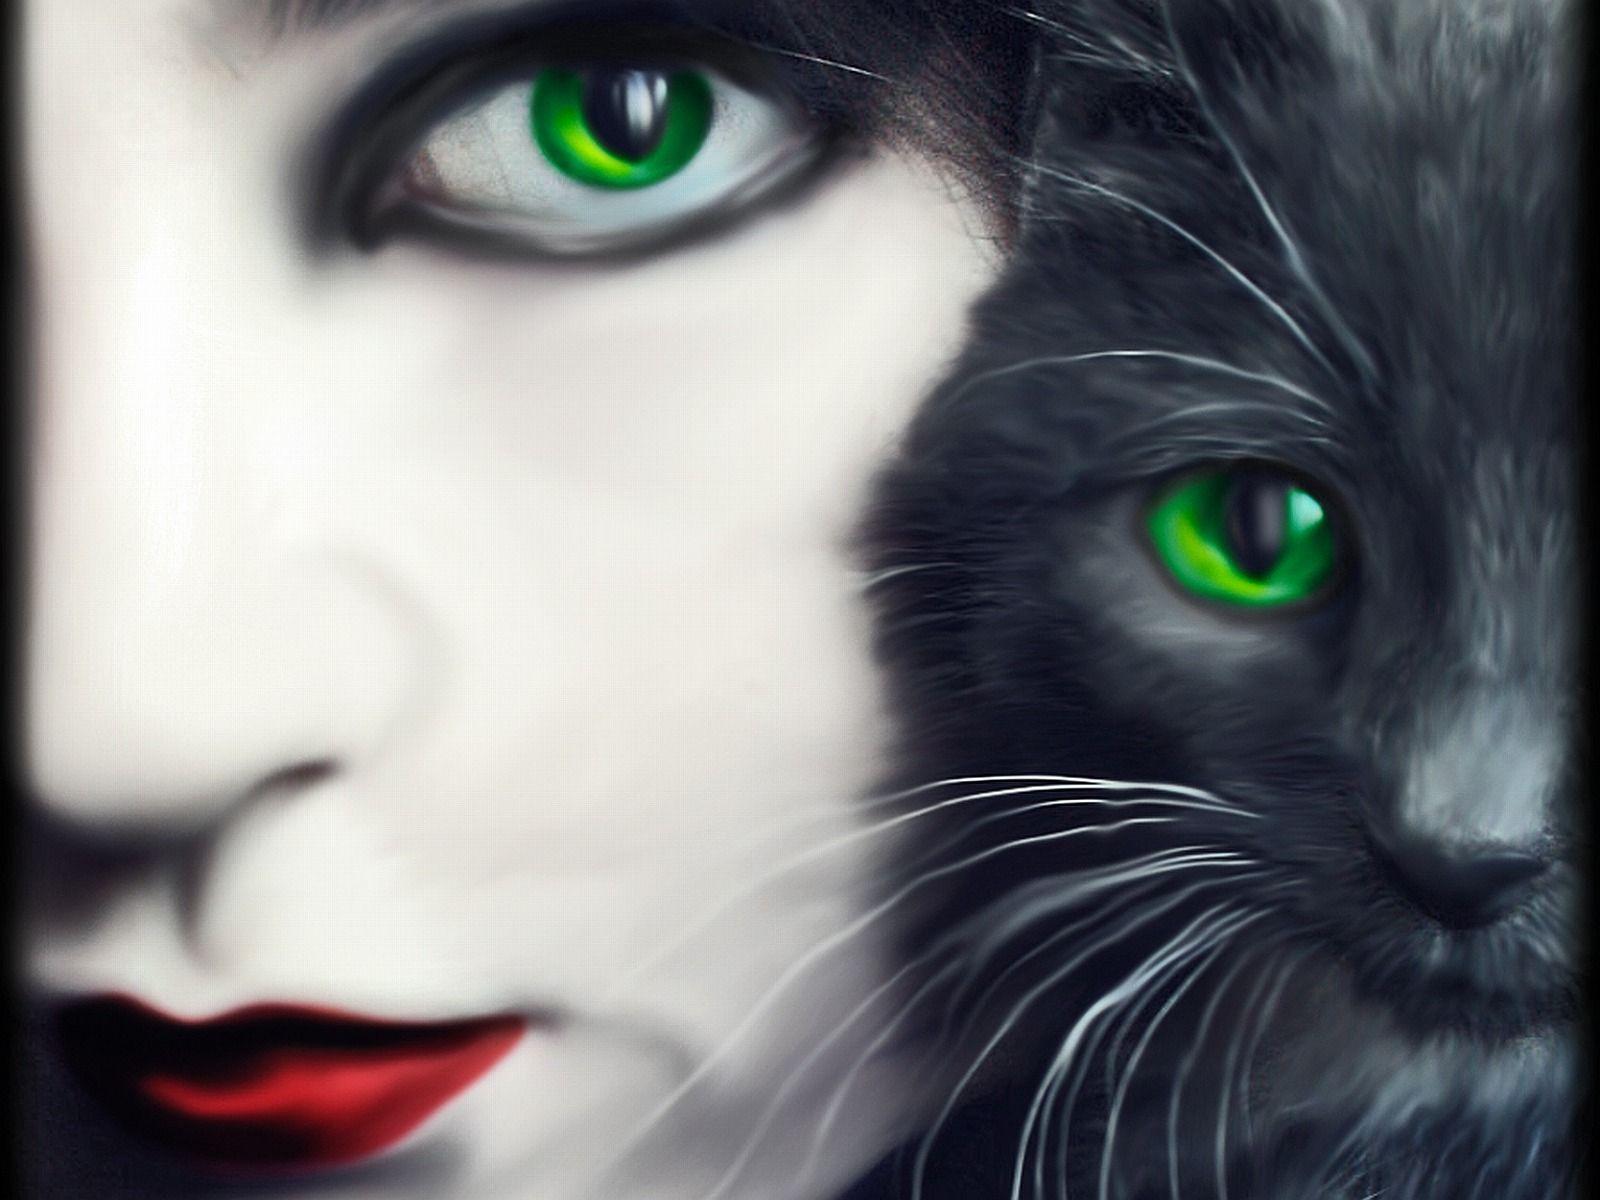 Green Eyes 3D abstract art cat CG eyes fantasy feline female 1600x1200